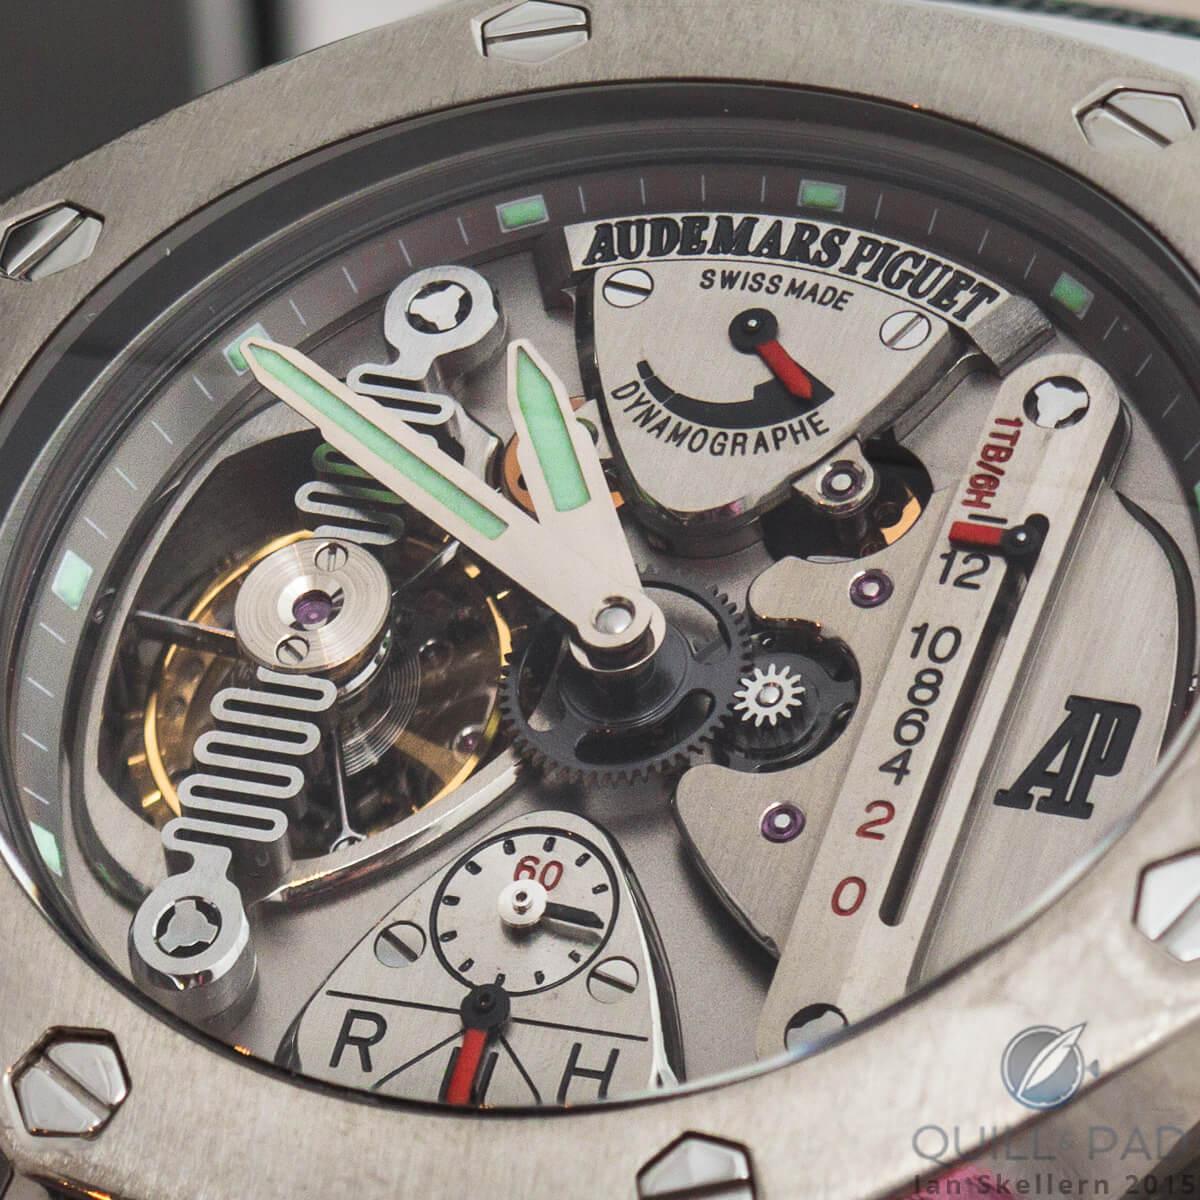 A close look dial side at the Audemars Piguet Royal Oak Concept Watch